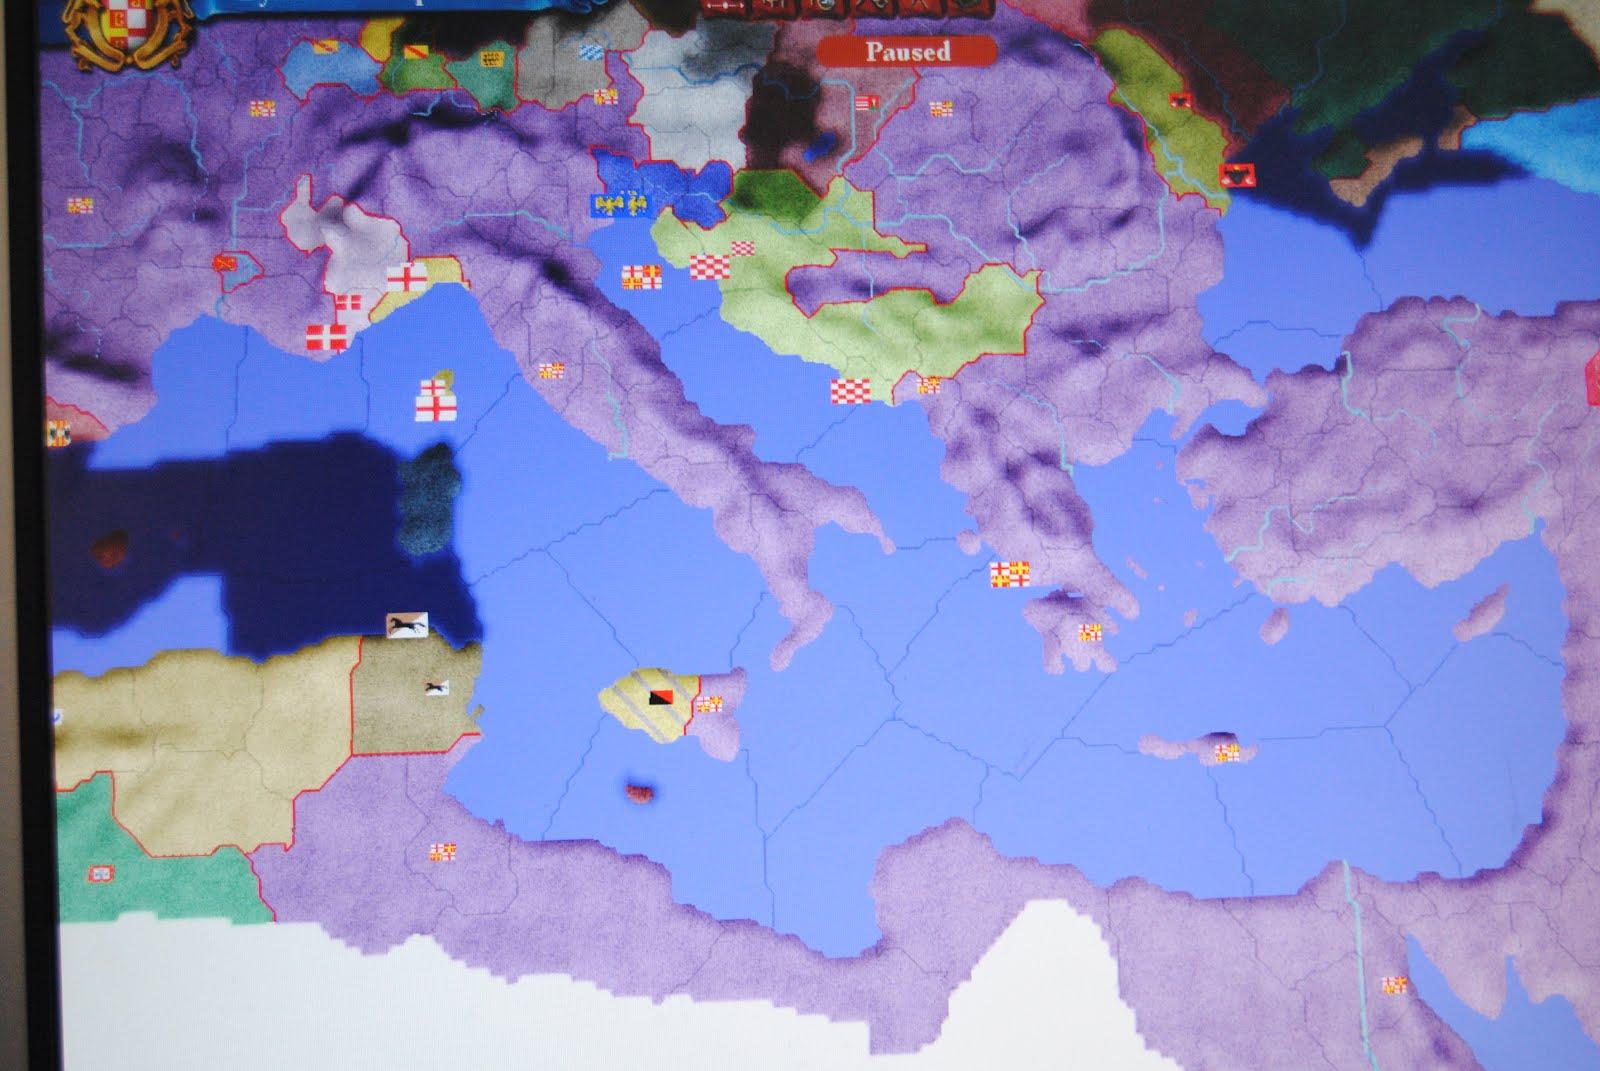 Europa Universalis IV - Byzantine Guide [1.14] Cossacks ...